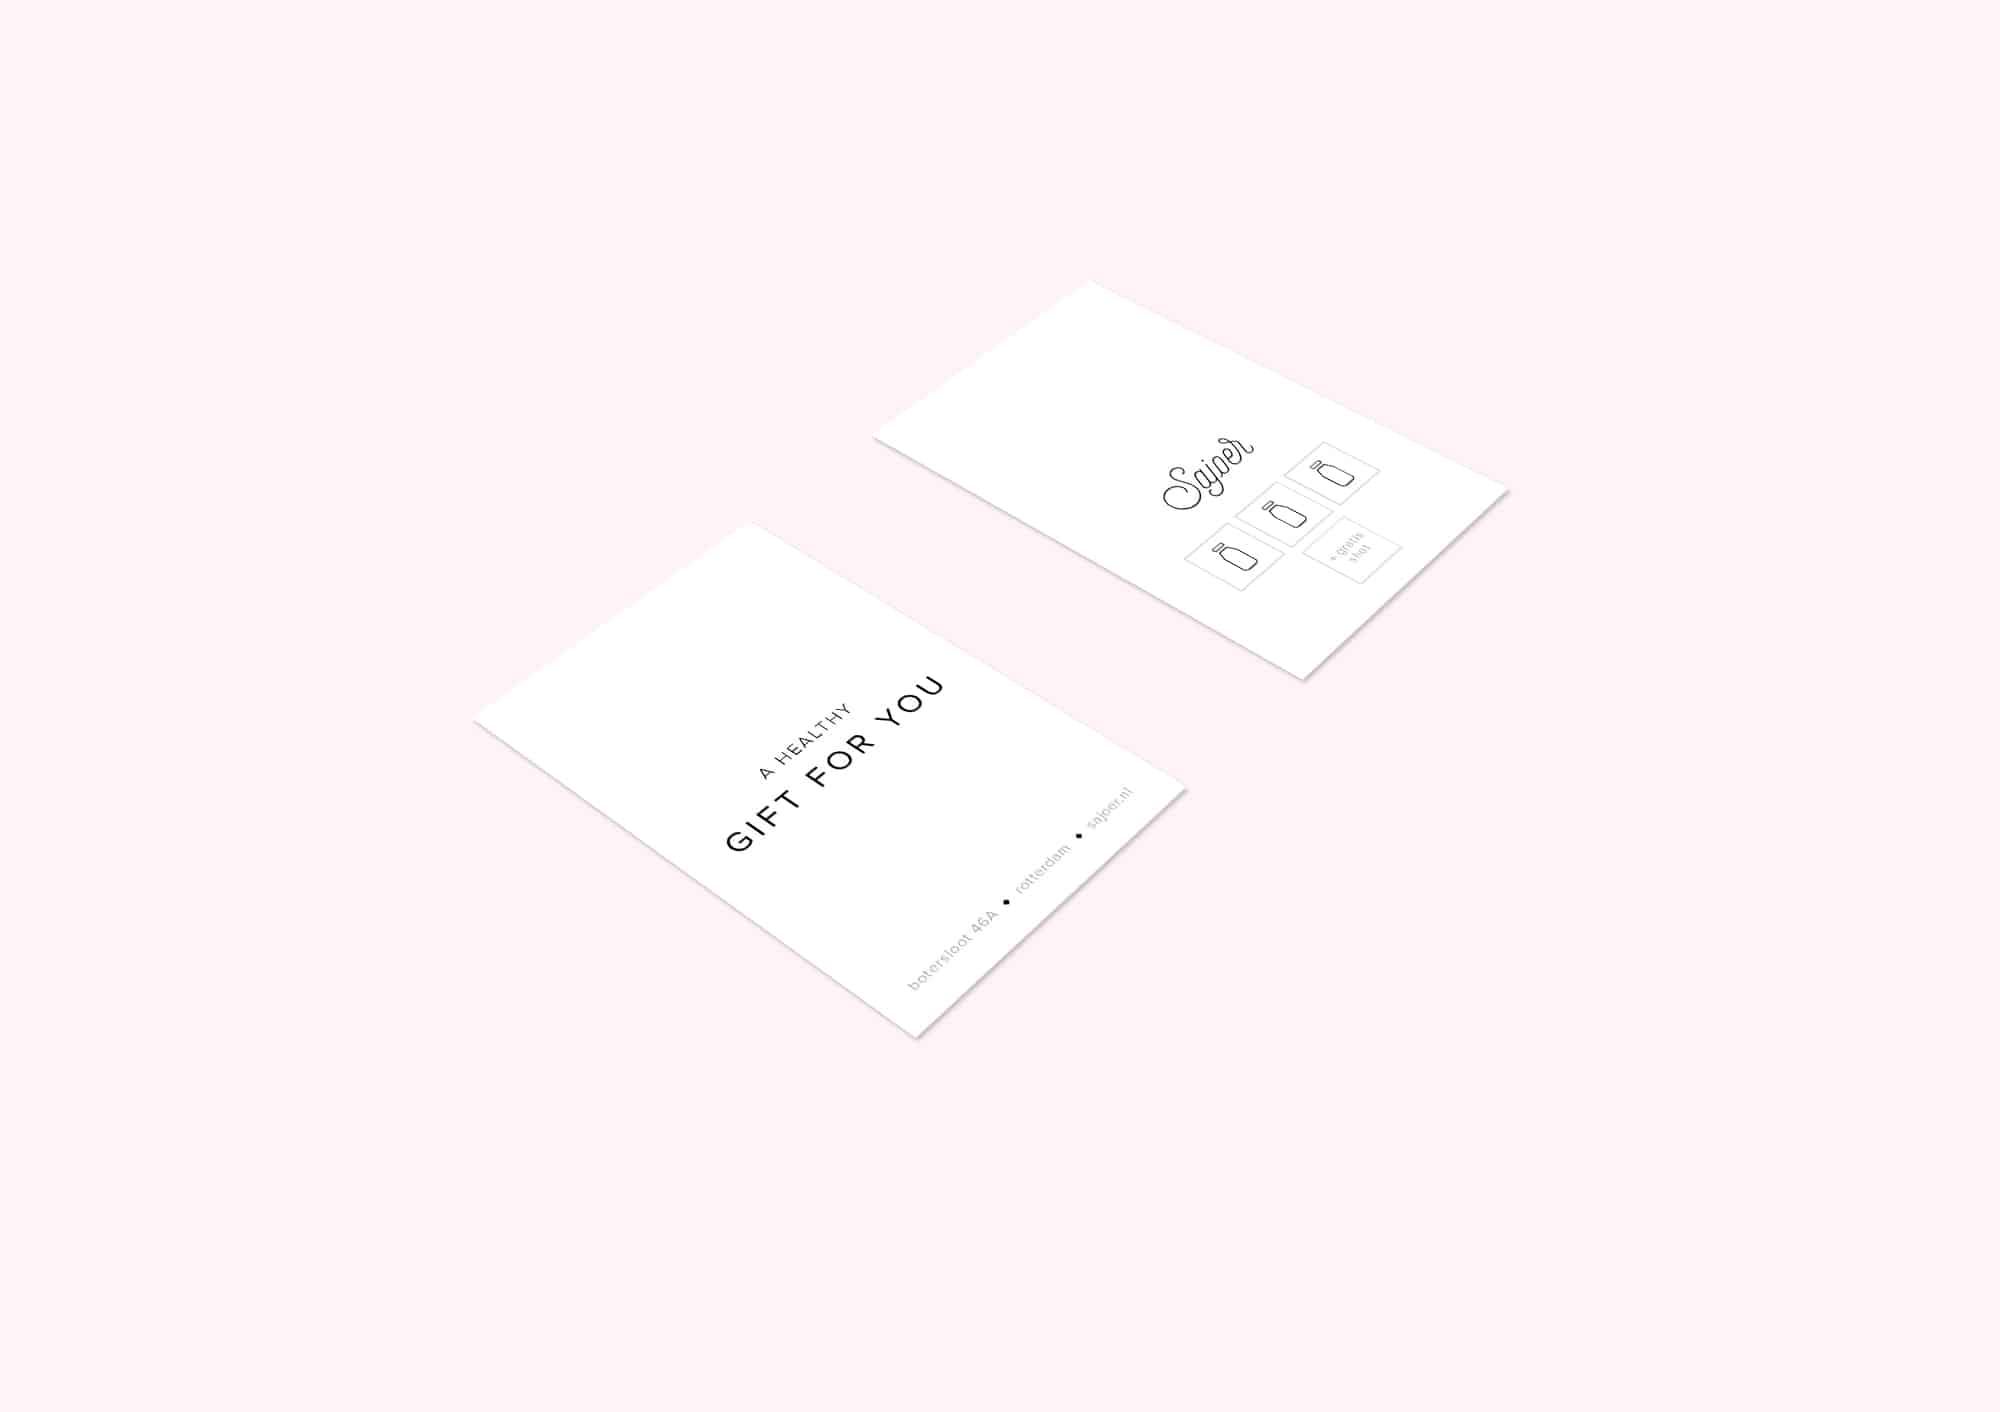 Design business cards for Sajoer Rotterdam